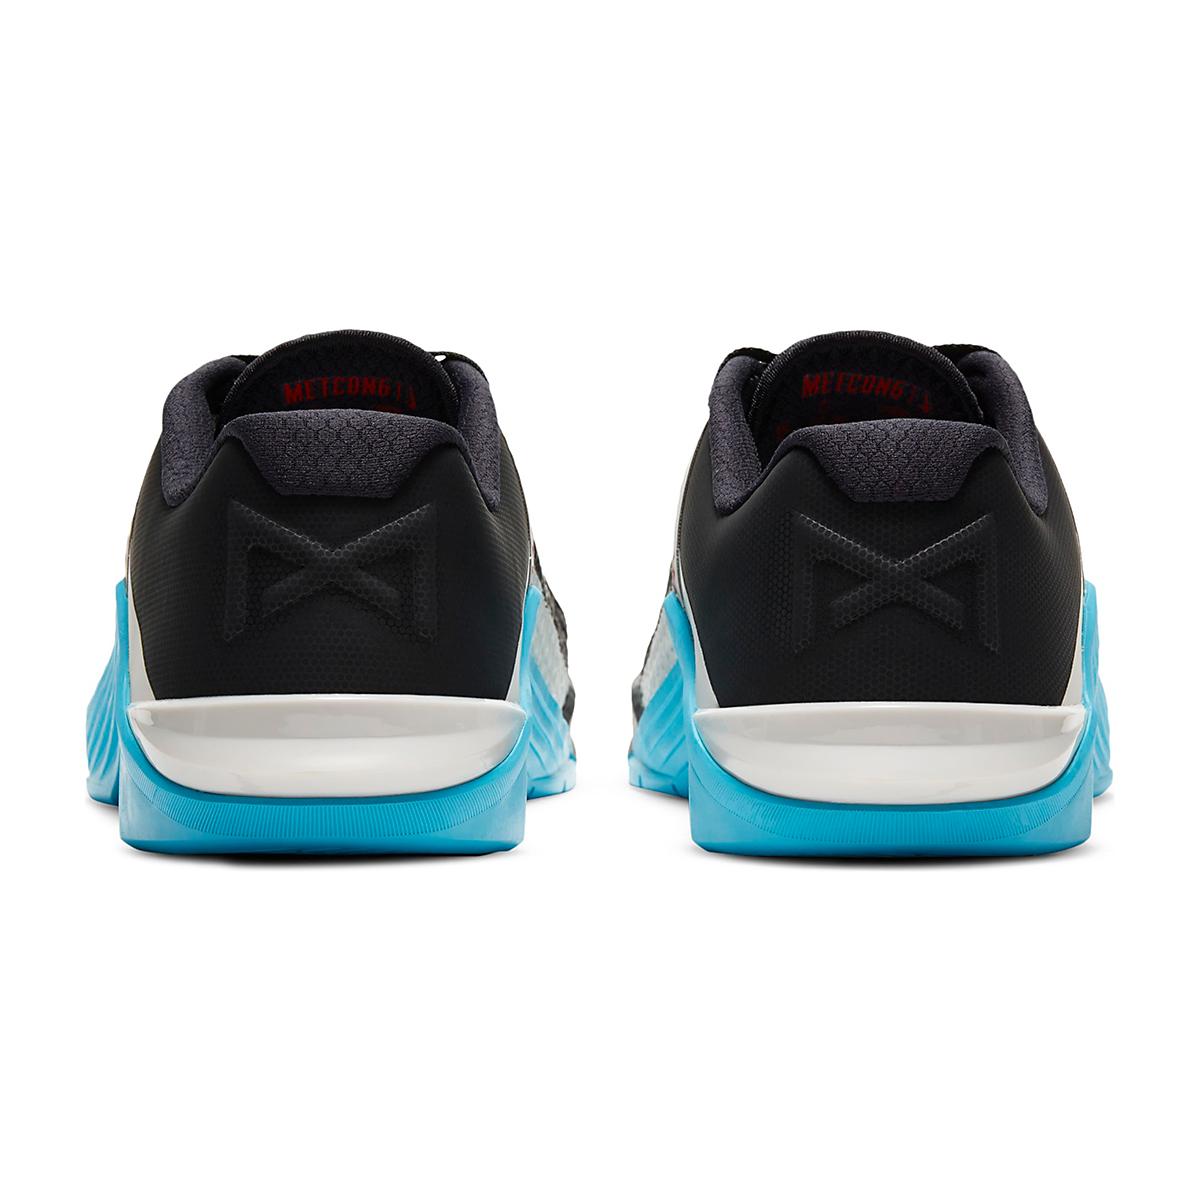 Men's Nike Metcon 6 Training Shoes - Color: Black/University Red/Light Blue Fury - Size: 5 - Width: Regular, Black/University Red/Light Blue Fury, large, image 5